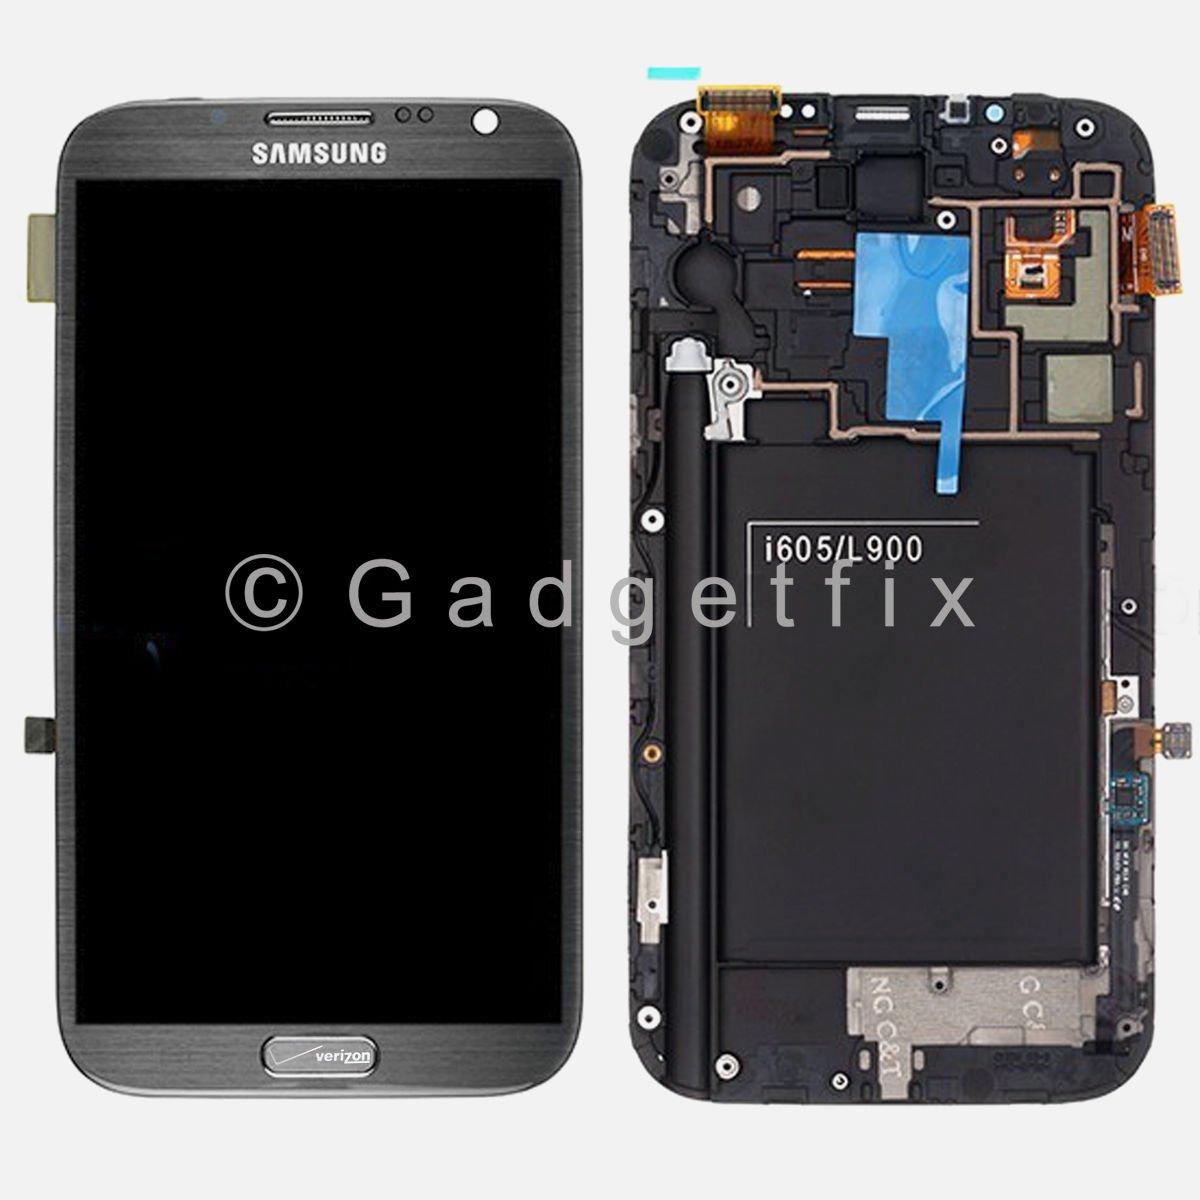 OEM Verizon Samsung Galaxy Note 2 i605 LCD Screen Touch Screen Digitizer Frame